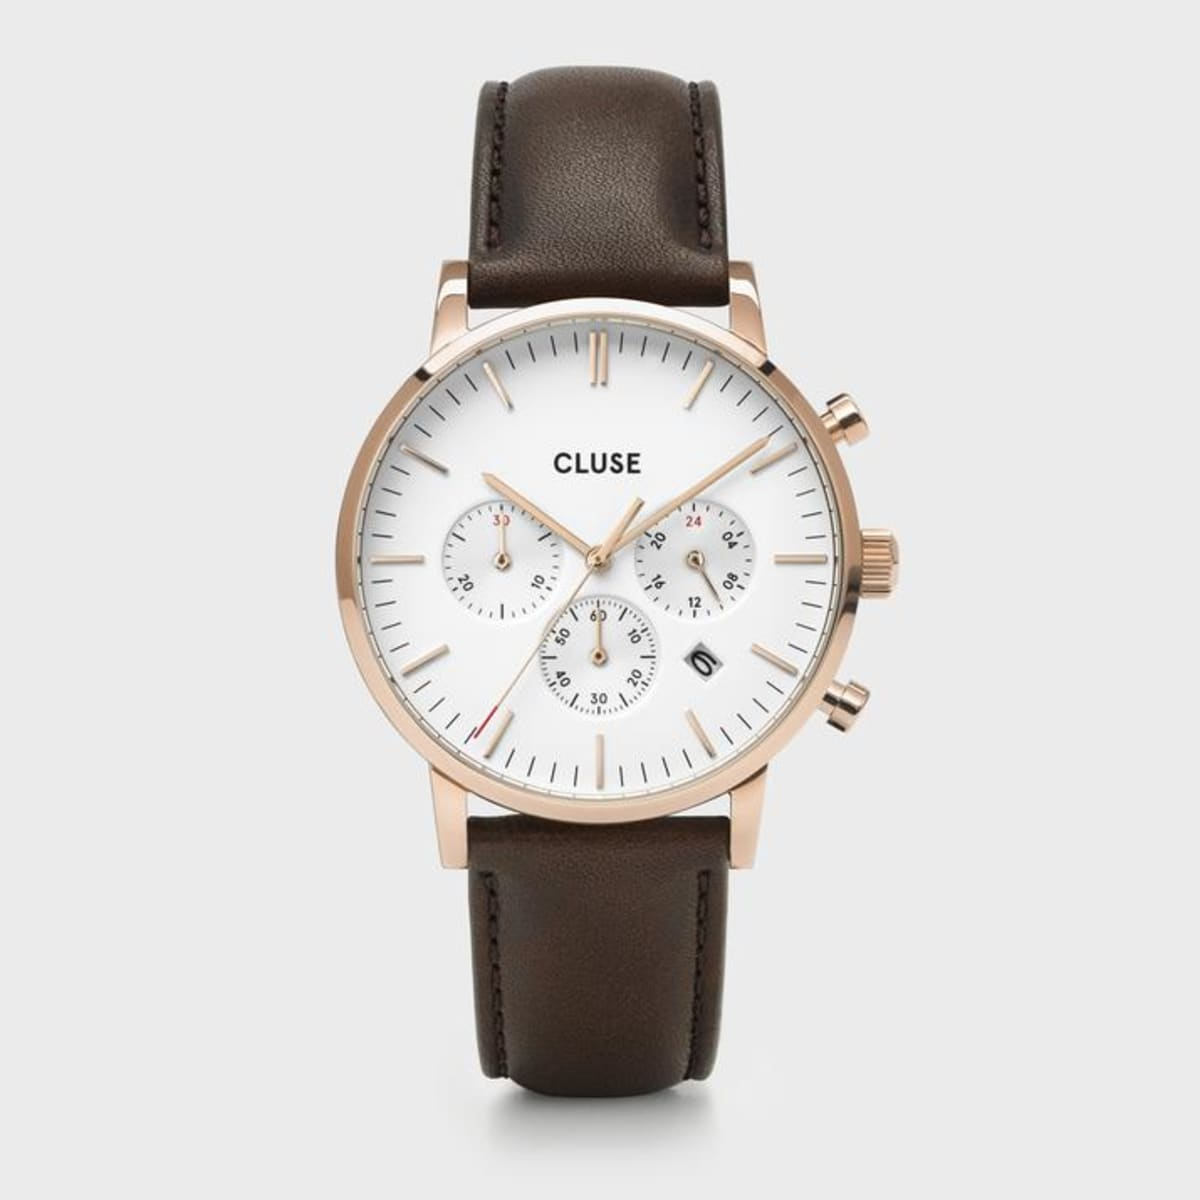 Orologio Uomo Cluse Aravis Cronografo 40mm Pelle Marrone Cassa Rosé